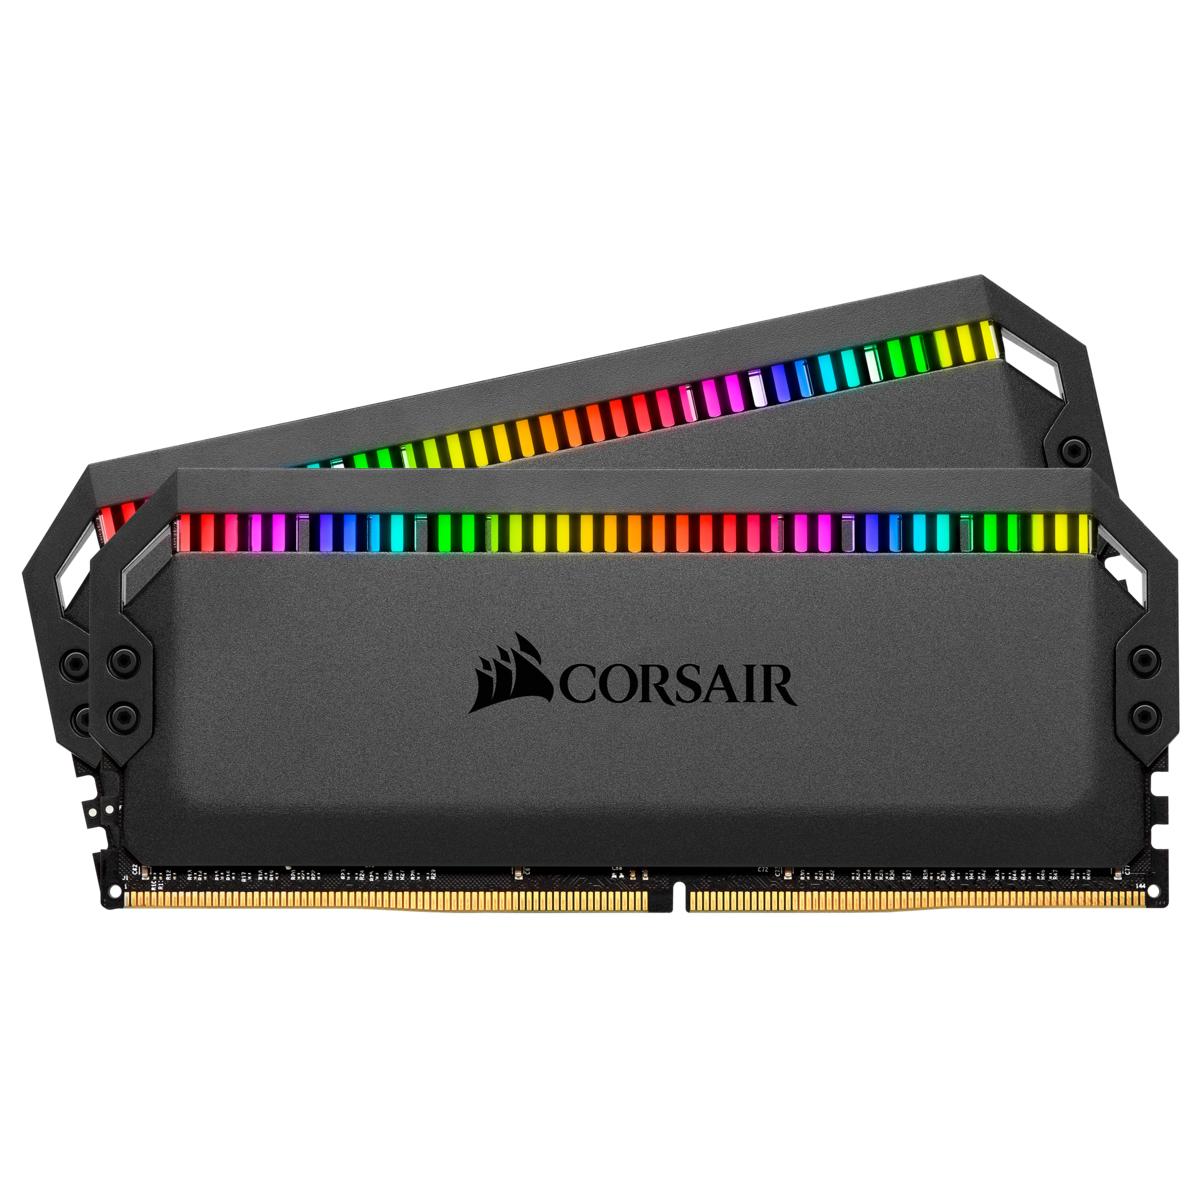 Corsair Dominator CMT32GX4M2D3600C18 - 32 GB - 2 x 16 GB - DDR4 - 3600 MHz